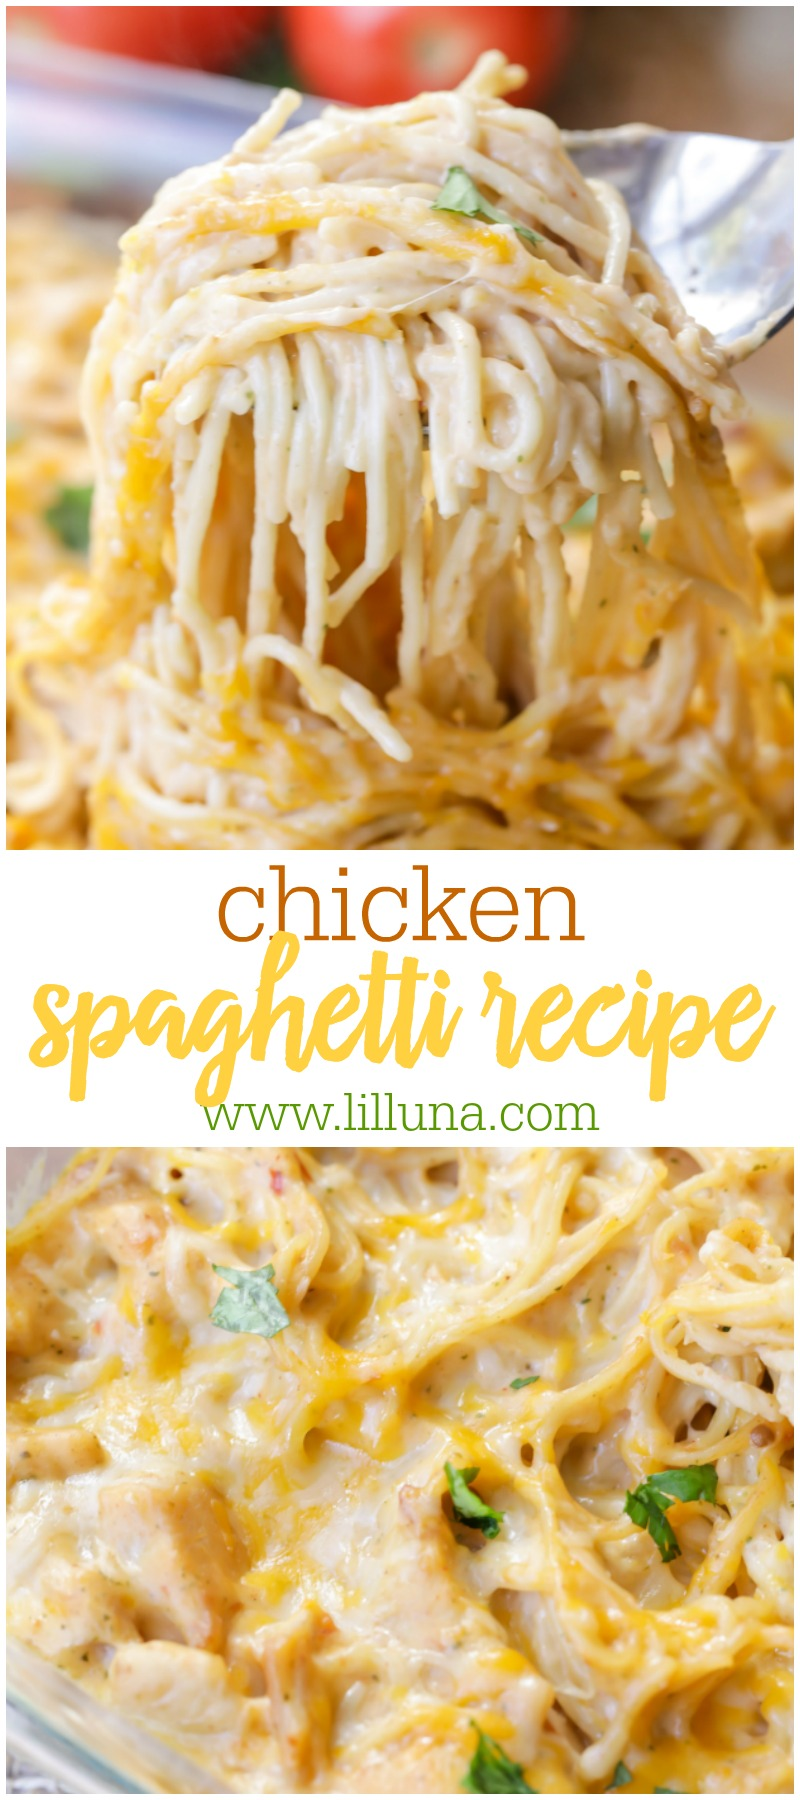 Photo of Family-Favorite Chicken Spaghetti Recipe (+VIDEO) | Lil' Luna – Recipes Blog for Everyone